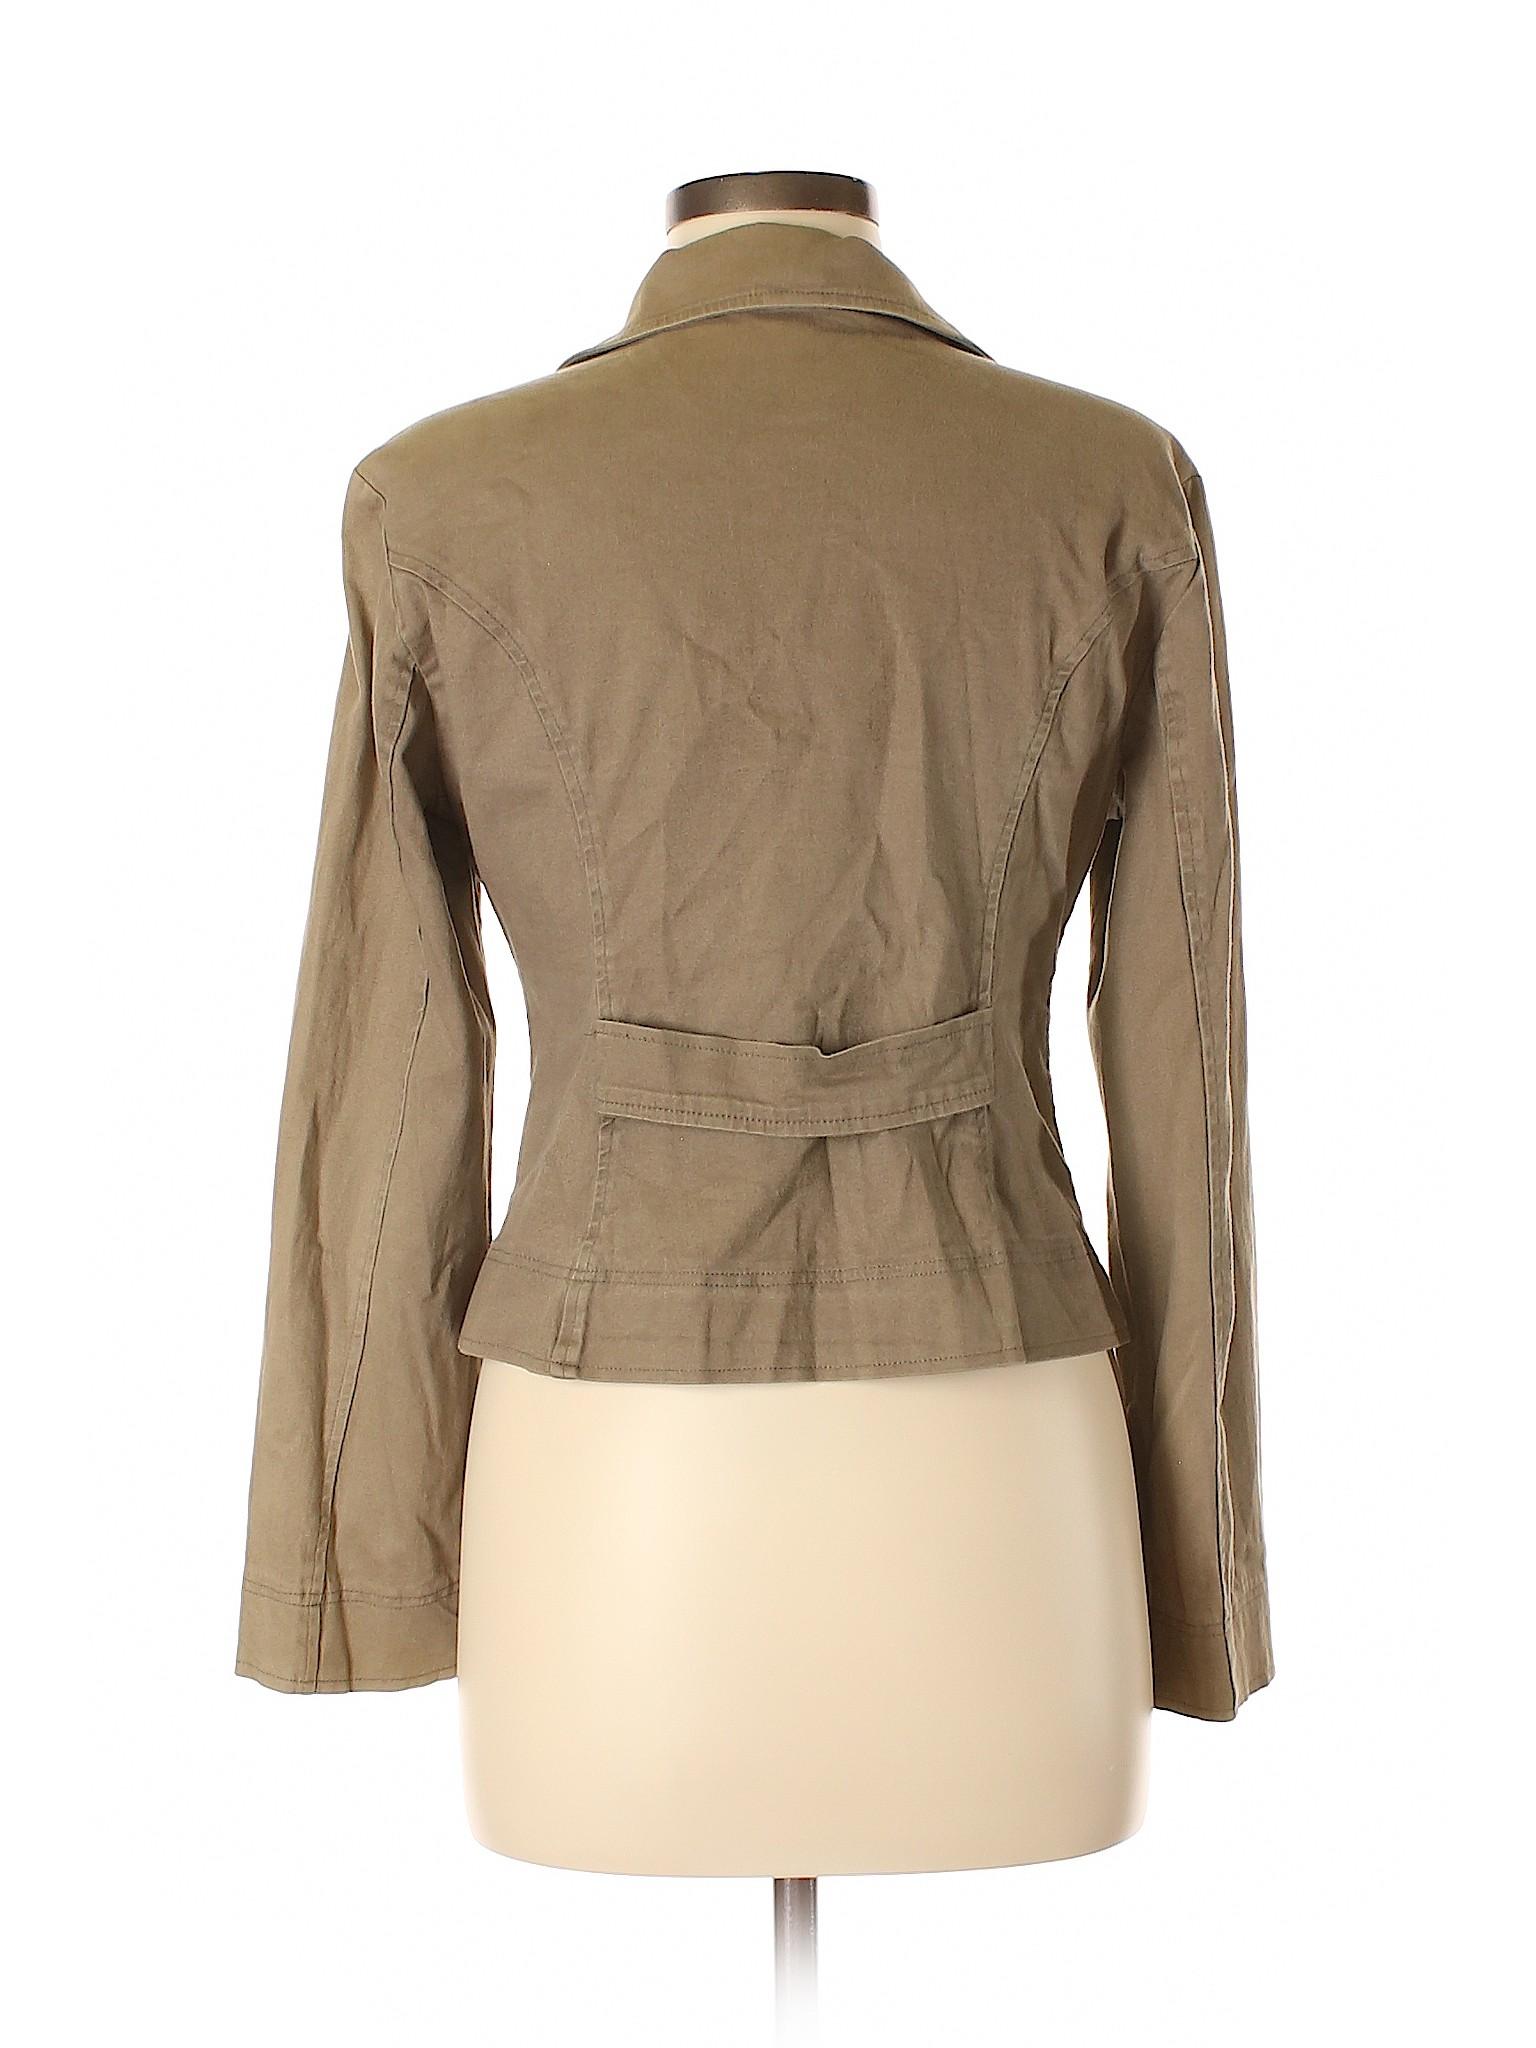 Jacket Jacket leisure Lux Boutique leisure Boutique Lux Lux Jacket Boutique leisure pOHqZq